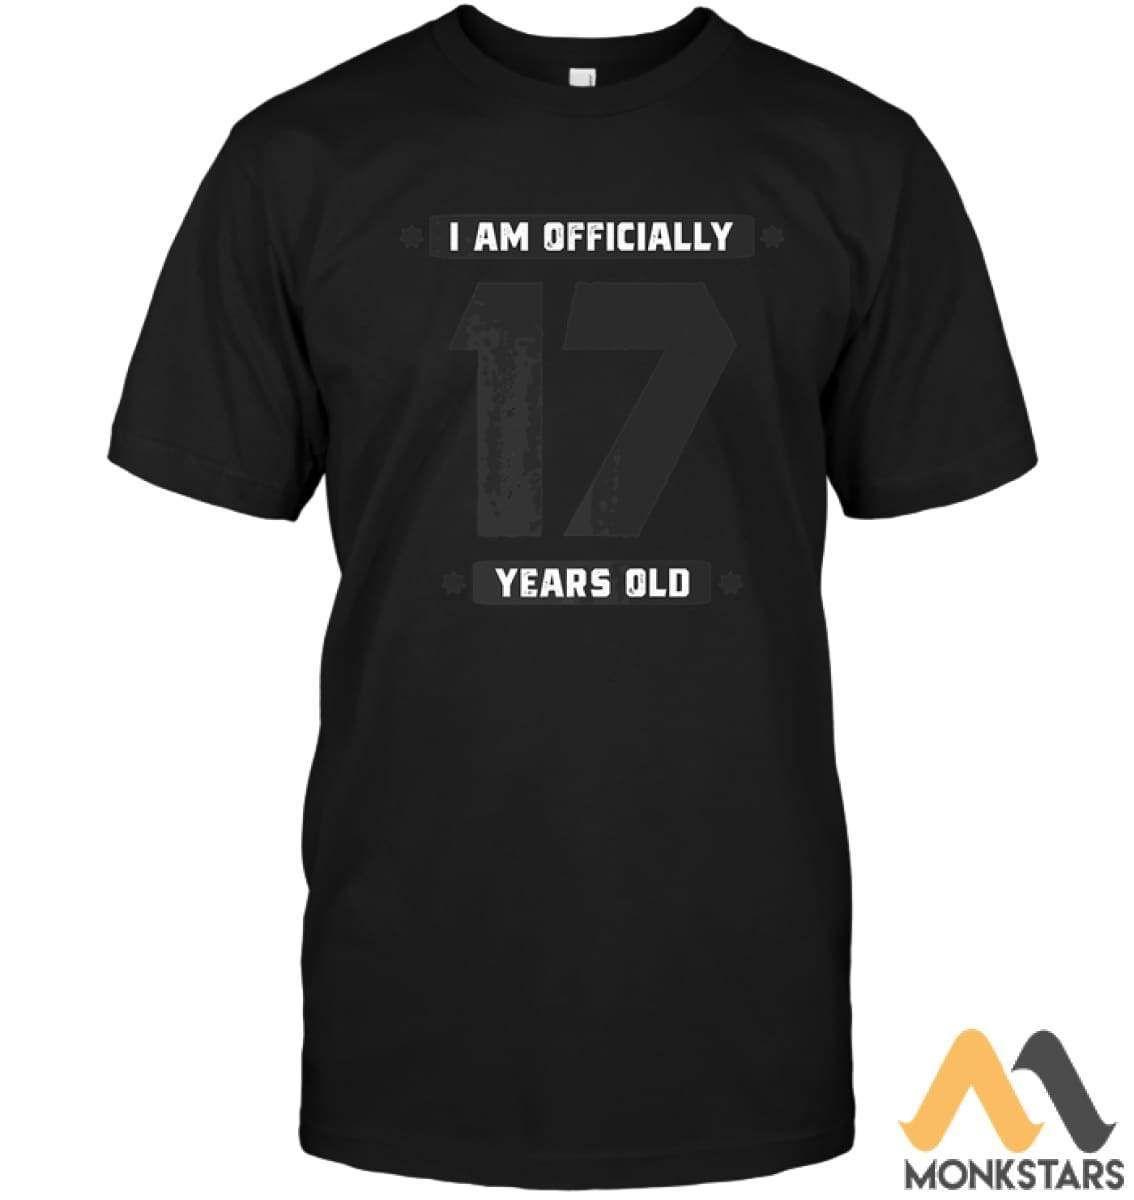 17th Birthday Shirt Age 17 Years Old Boys Girls Gift Son - Monkstars Inc. #17thbirthday